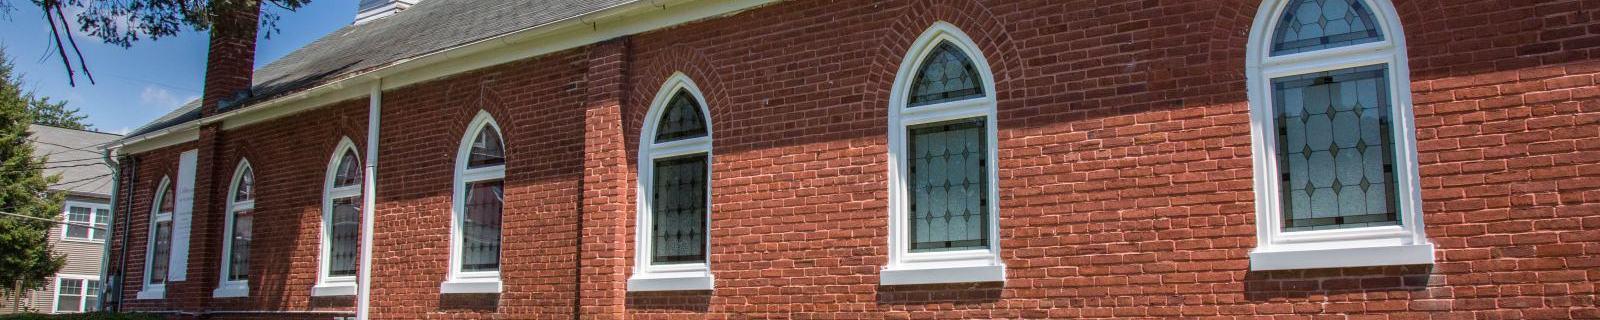 church with new windows